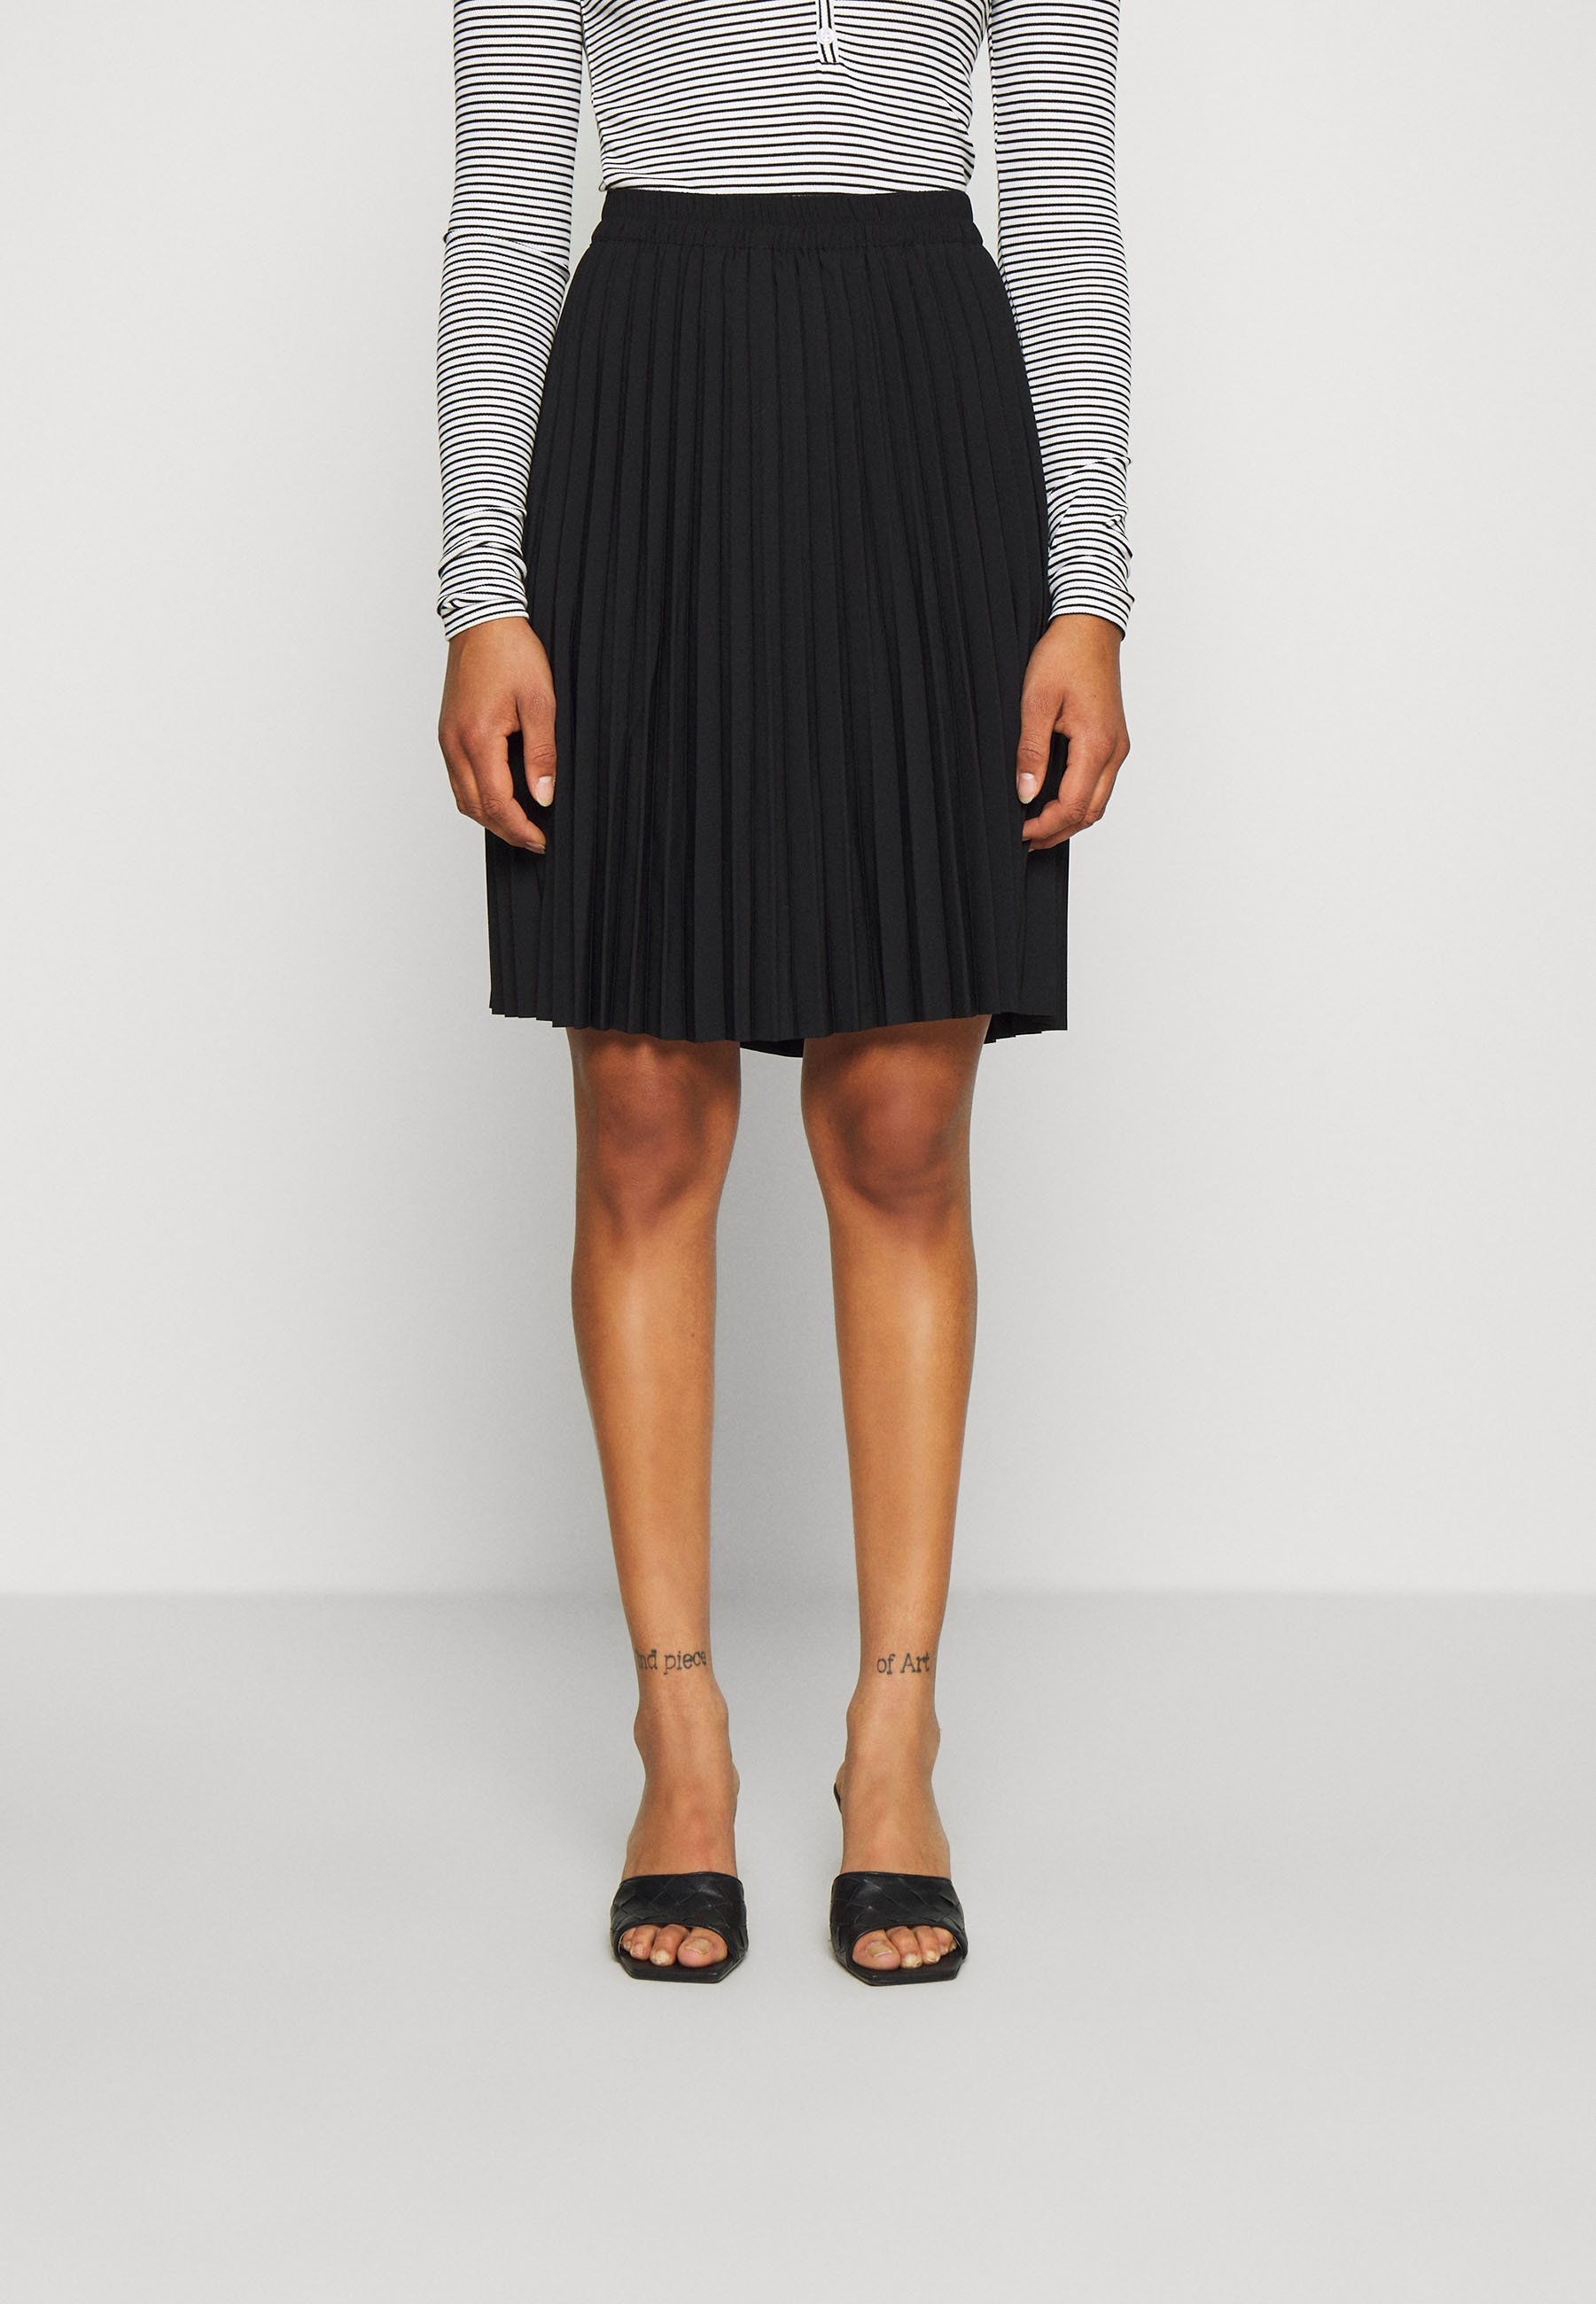 Femme ALEXIS SHORT SKIRT - Minijupe